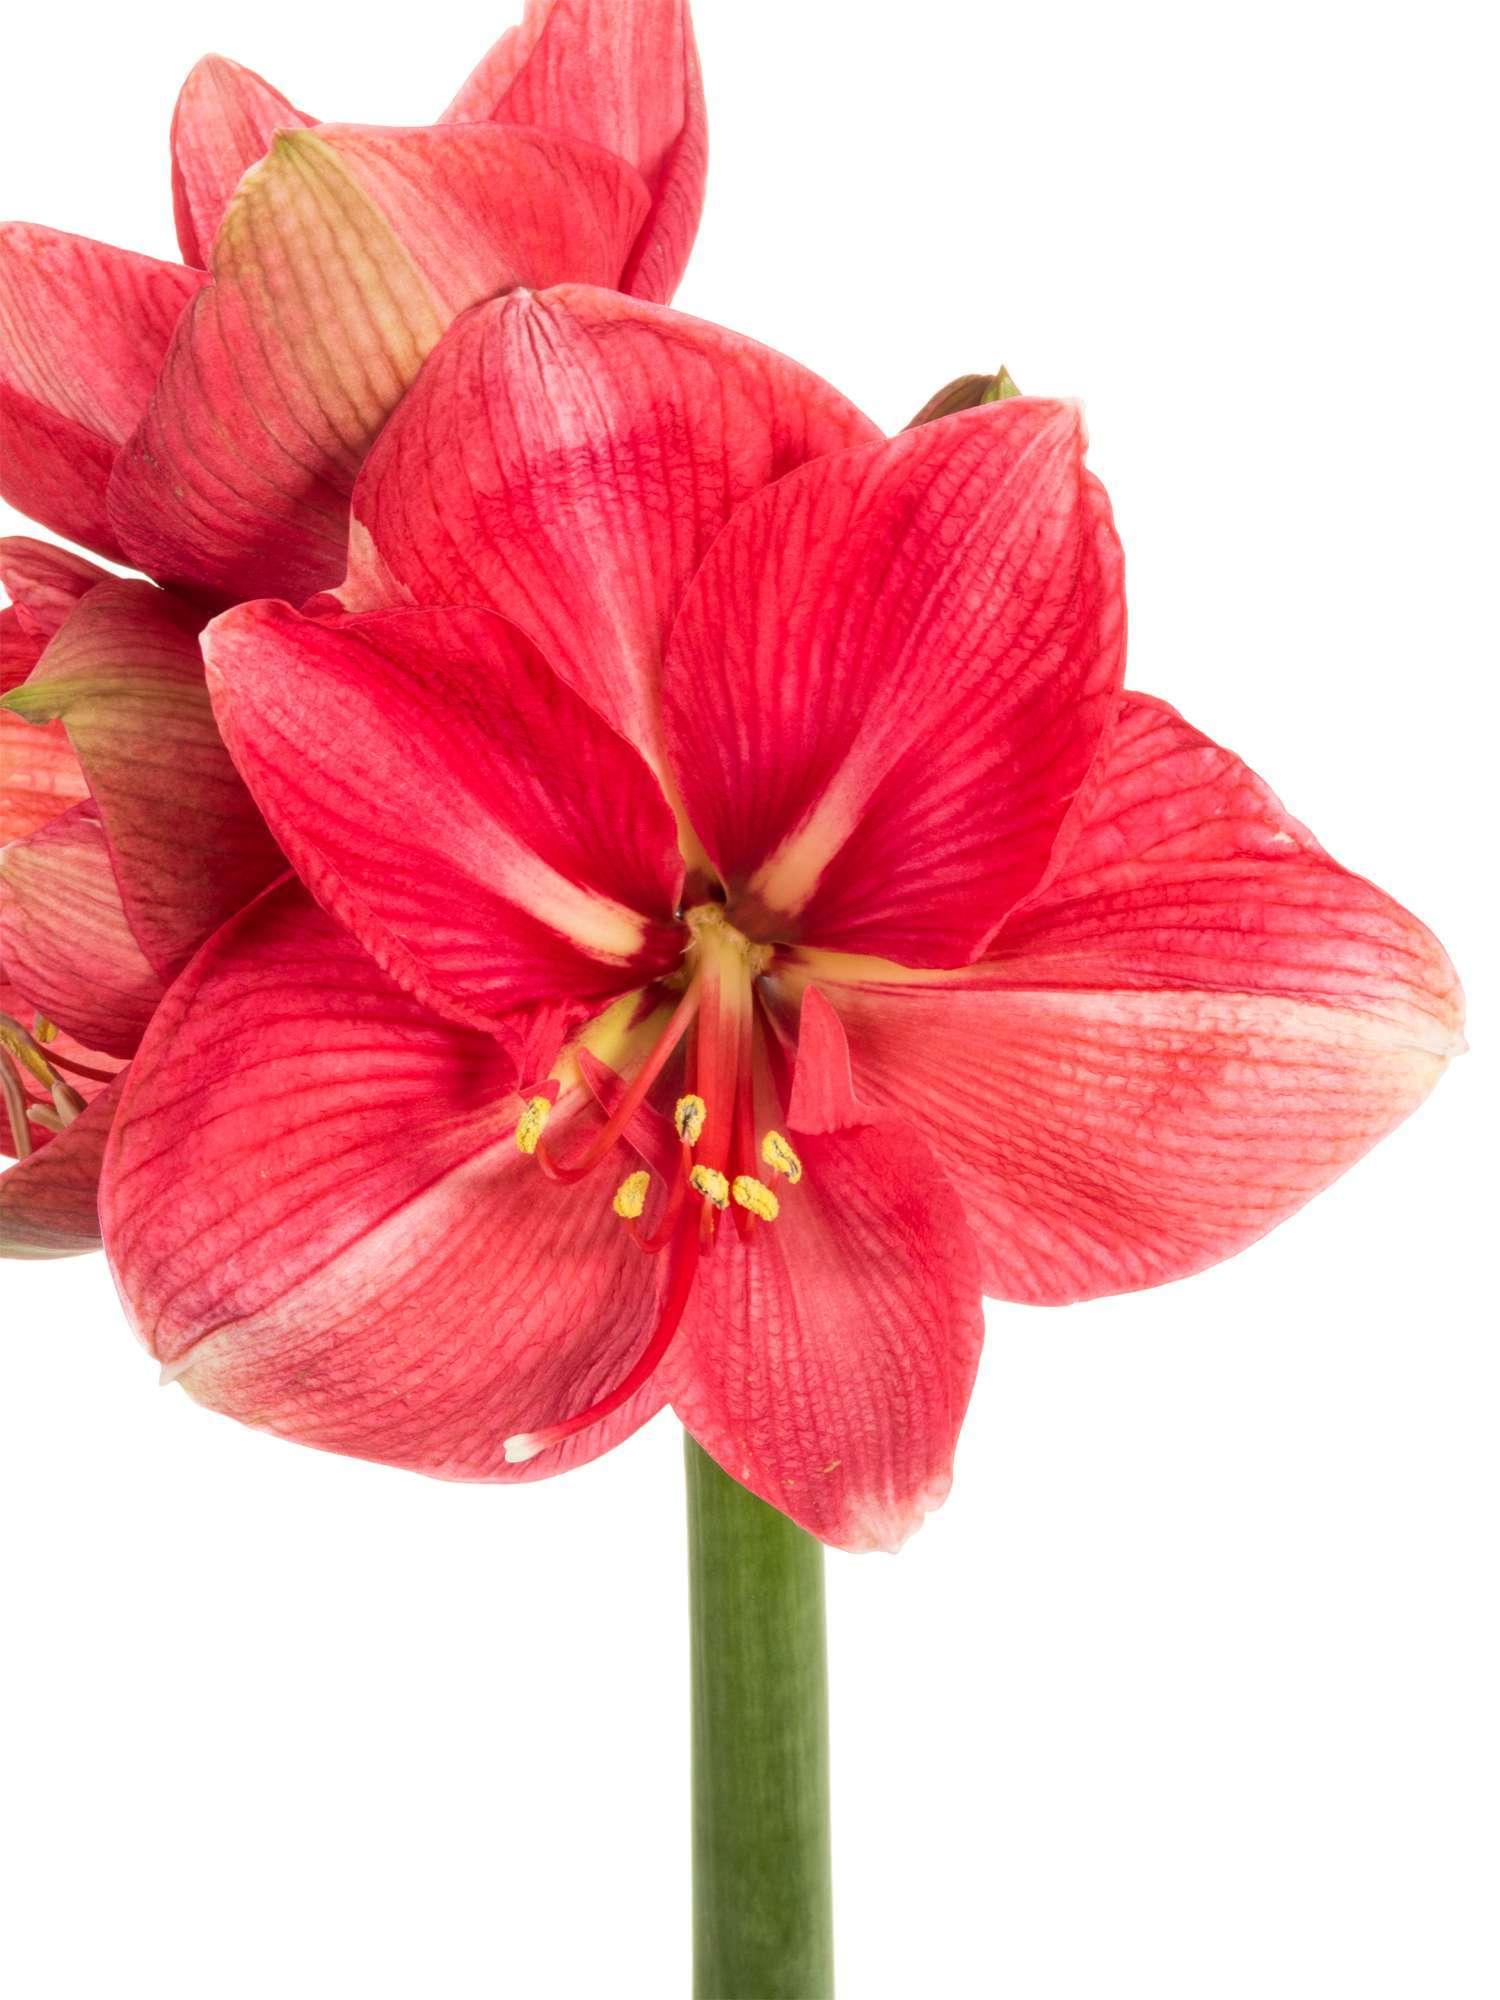 amaryllis hercules pink bestellen blumigo. Black Bedroom Furniture Sets. Home Design Ideas